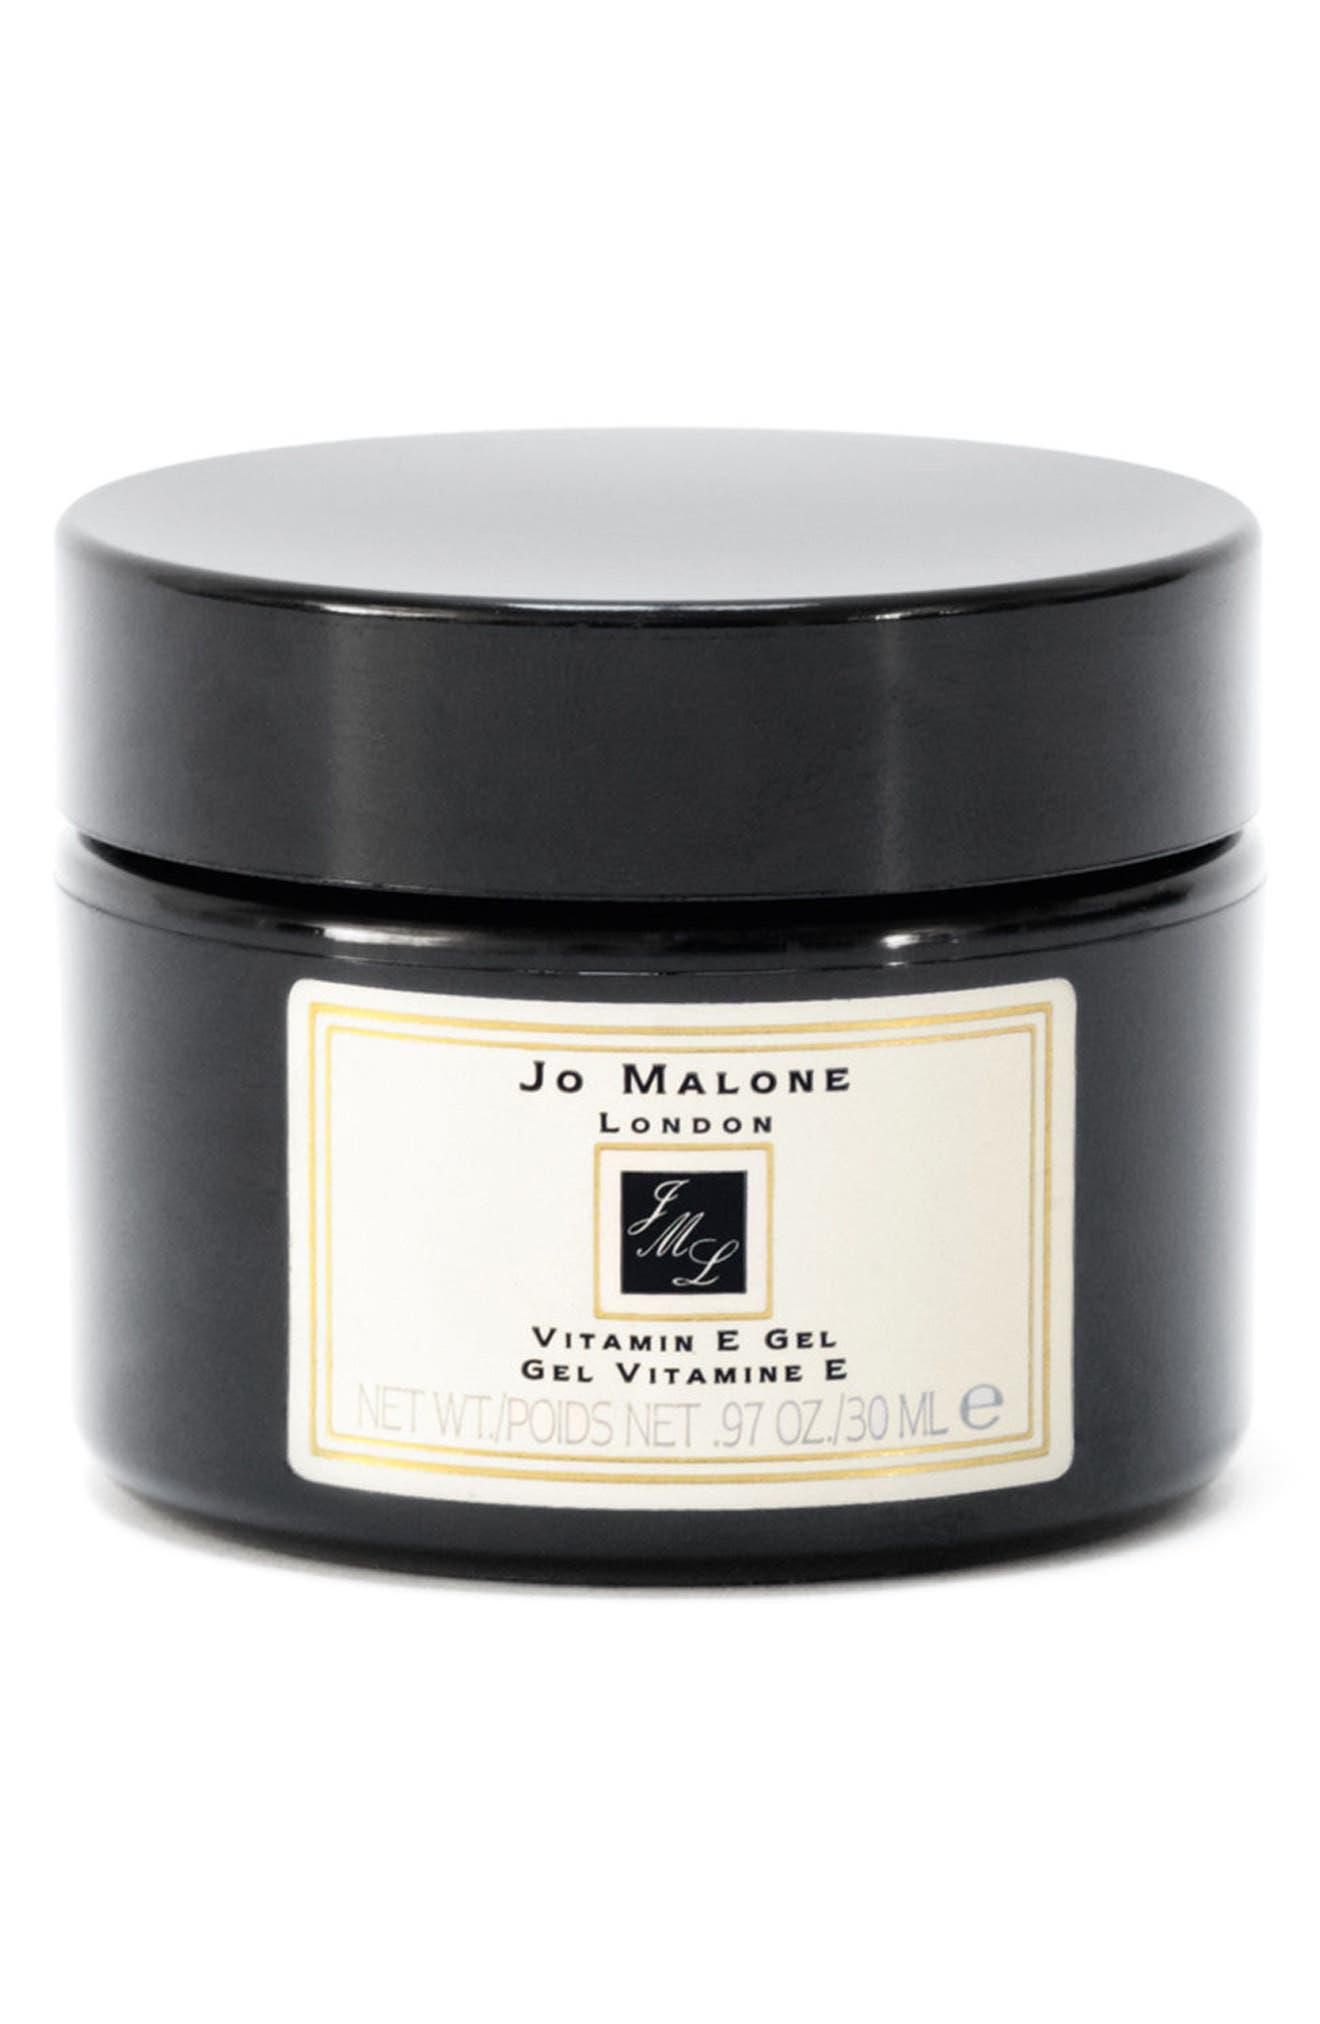 Jo Malone London™ 'Vitamin E' Gel